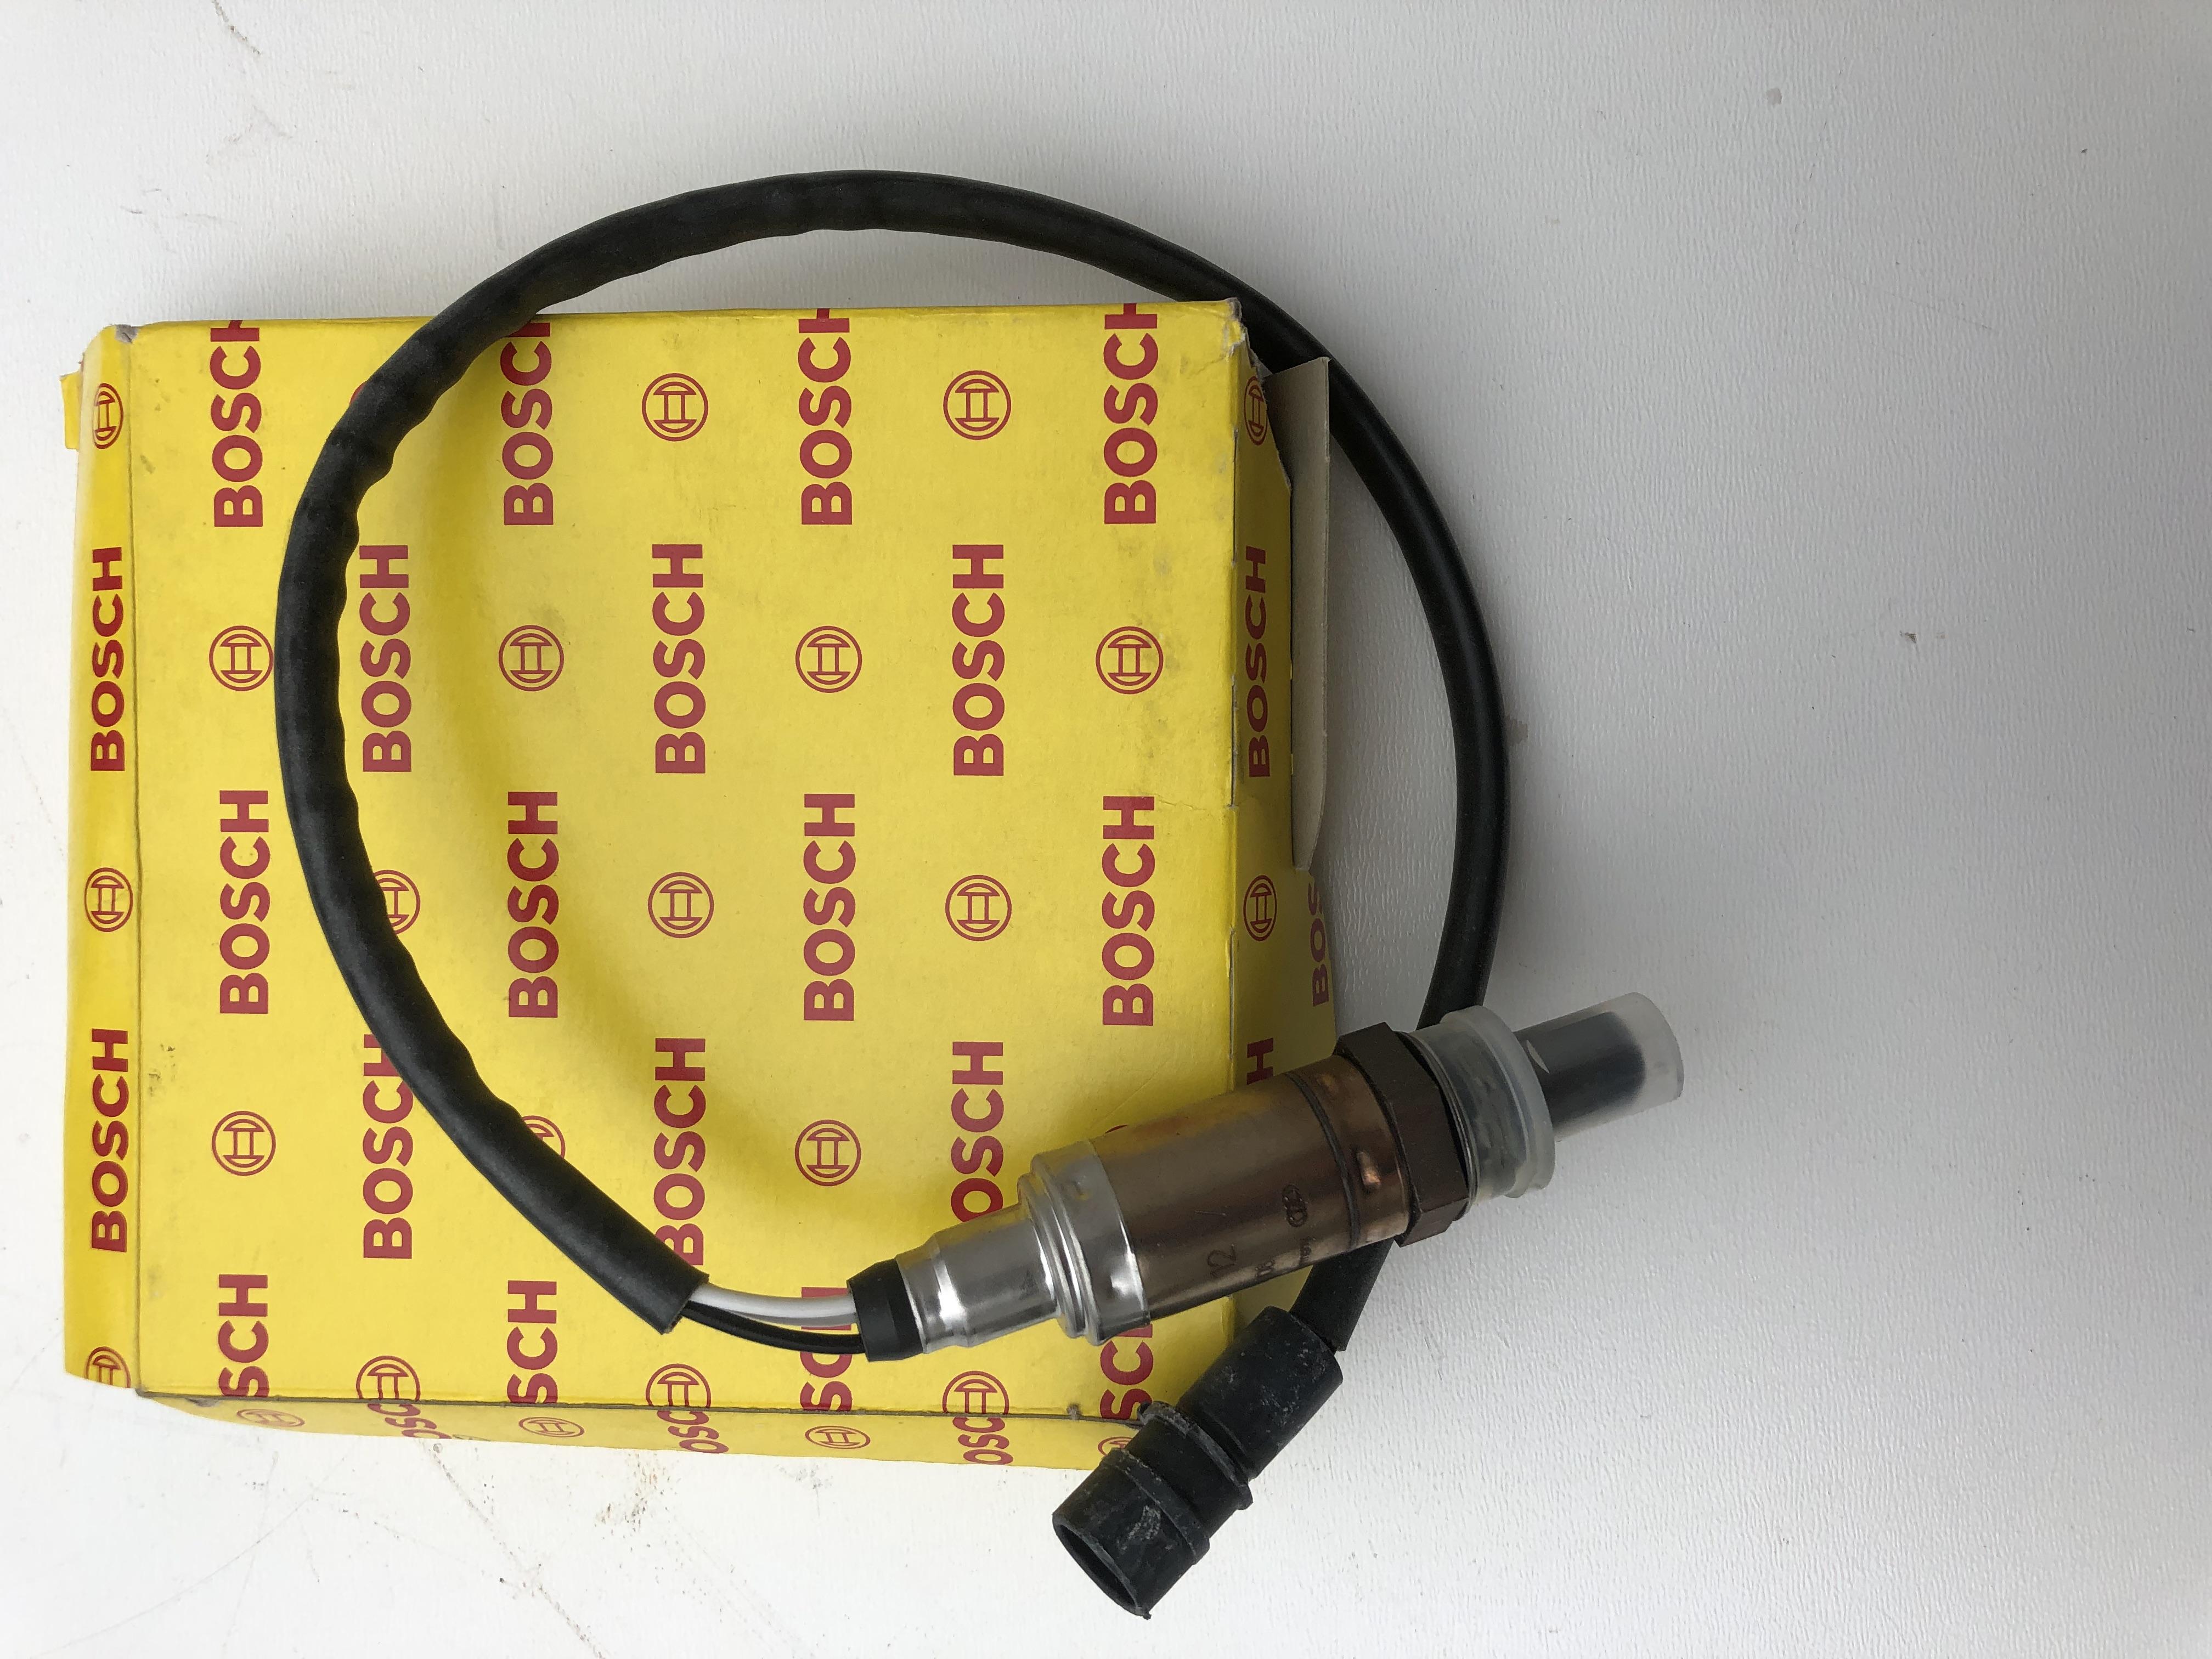 Bosch 02580003008 Lambdasonde sonda lambda sonde lambda Sonde